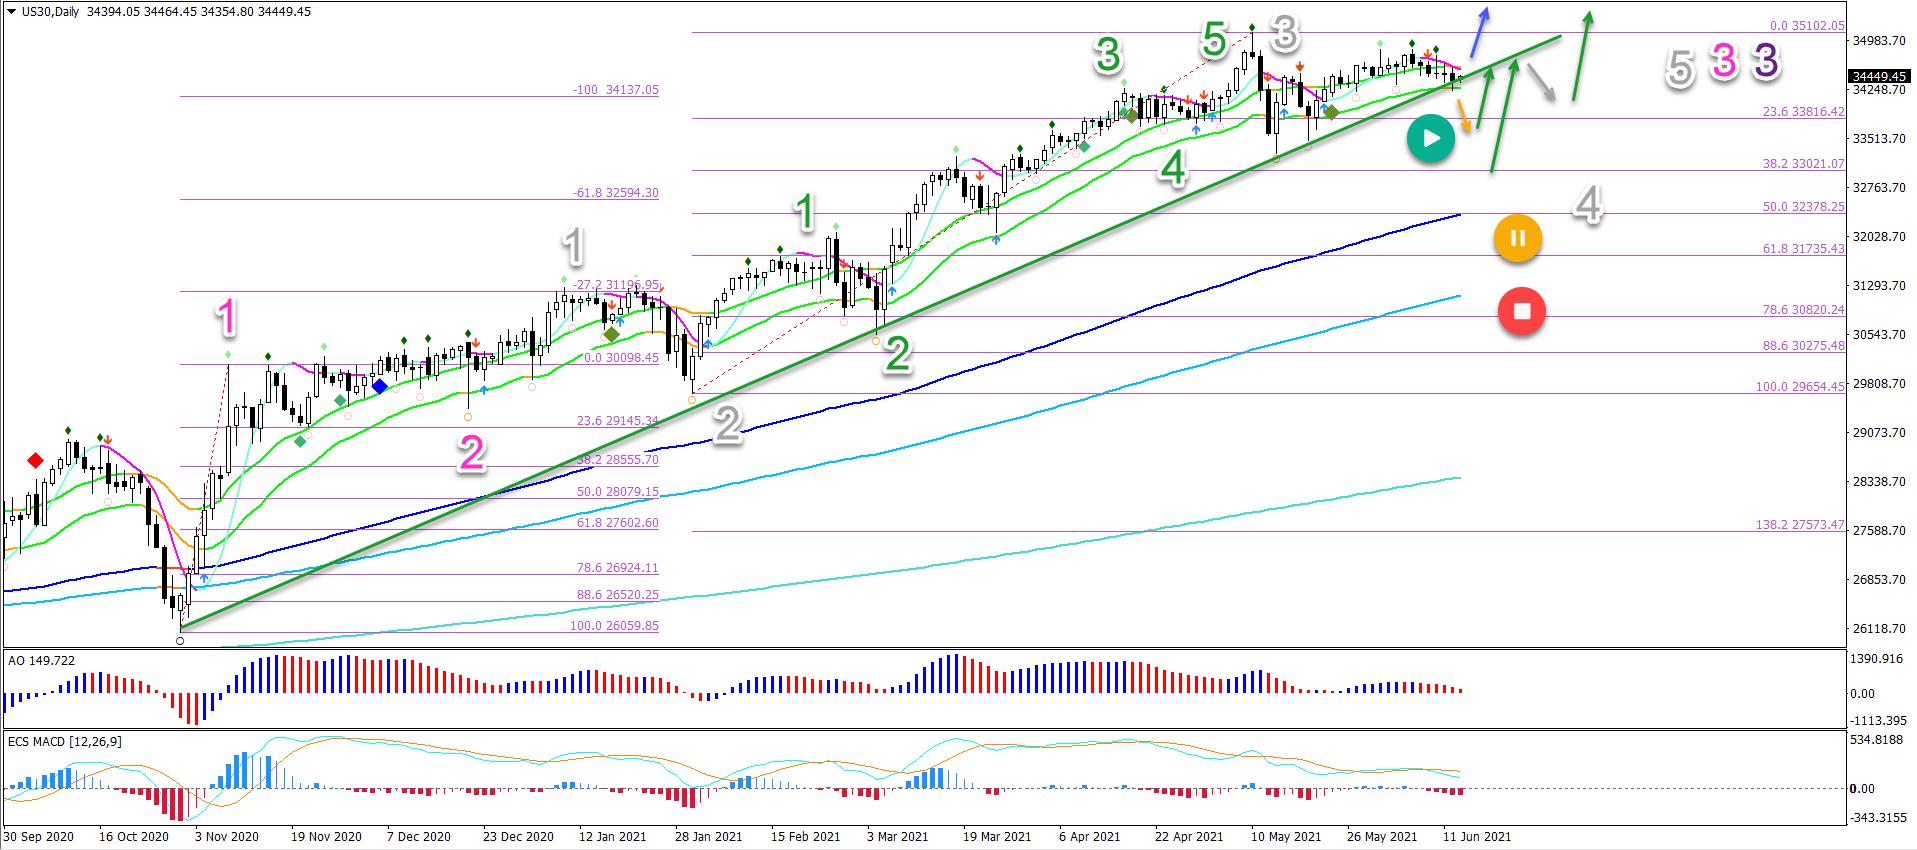 Dow Jones 15.06.2021 daily chart